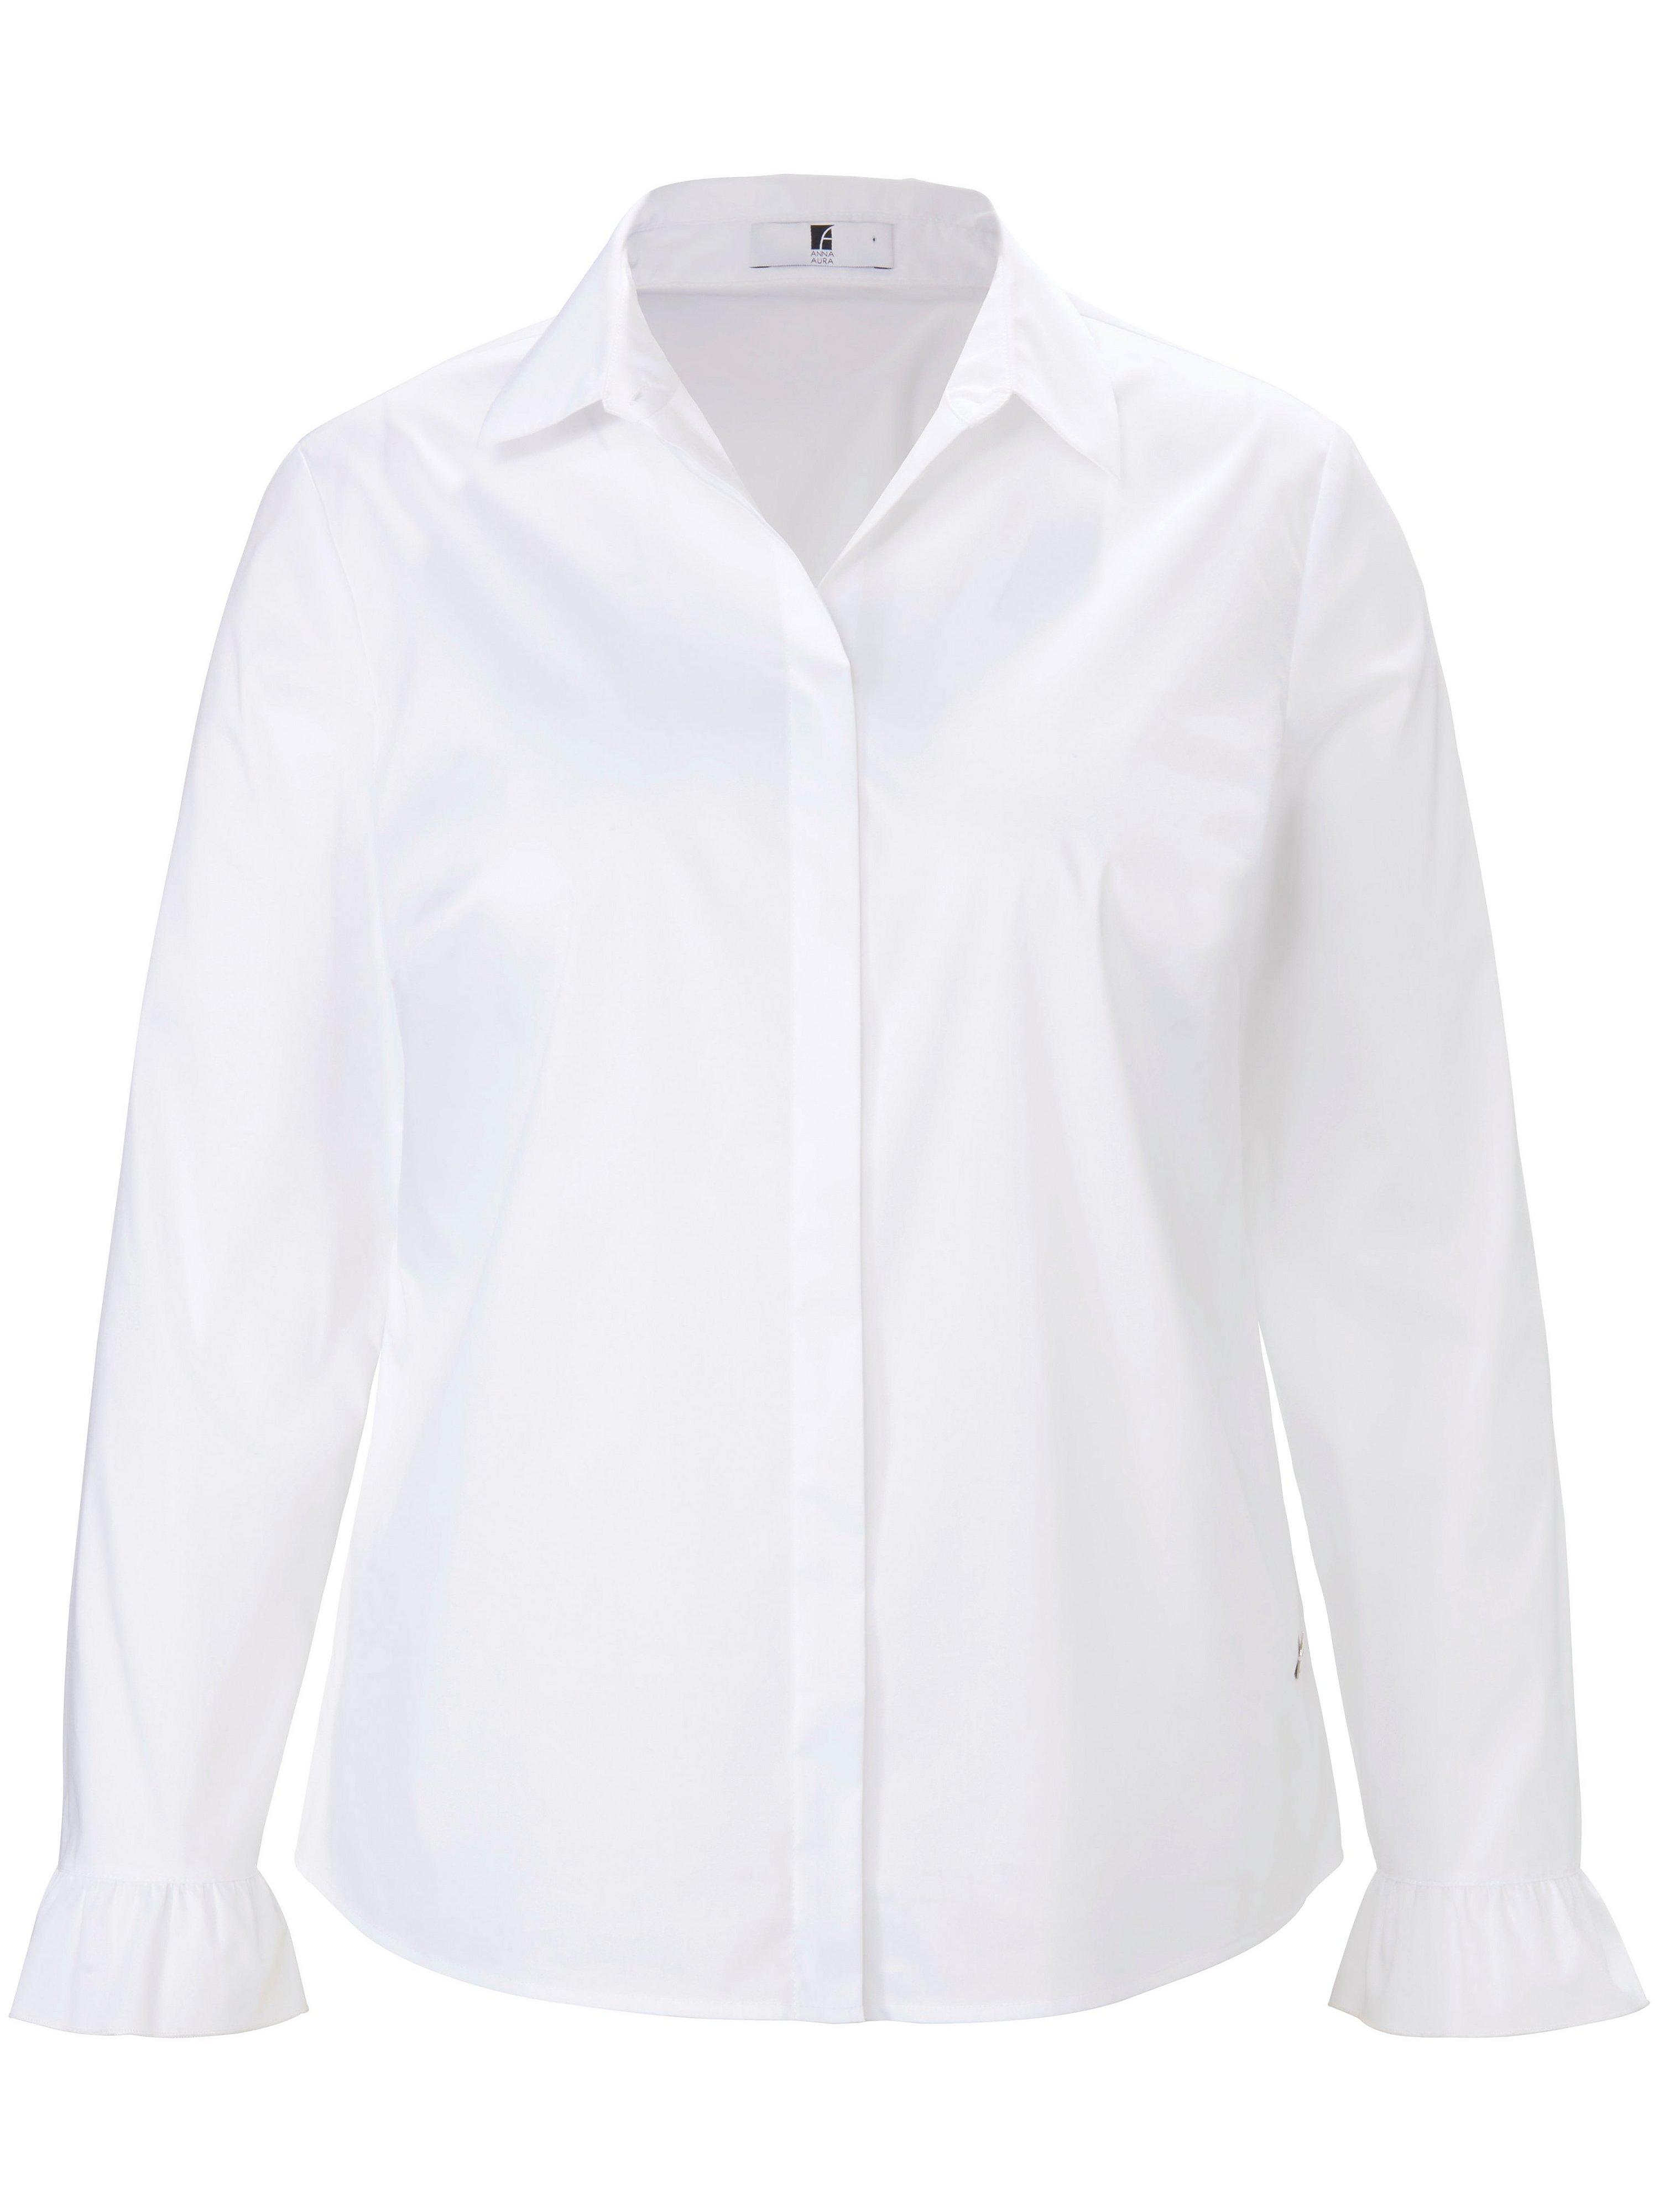 Blouse in overhemdmodel lange mouwen Van Anna Aura wit